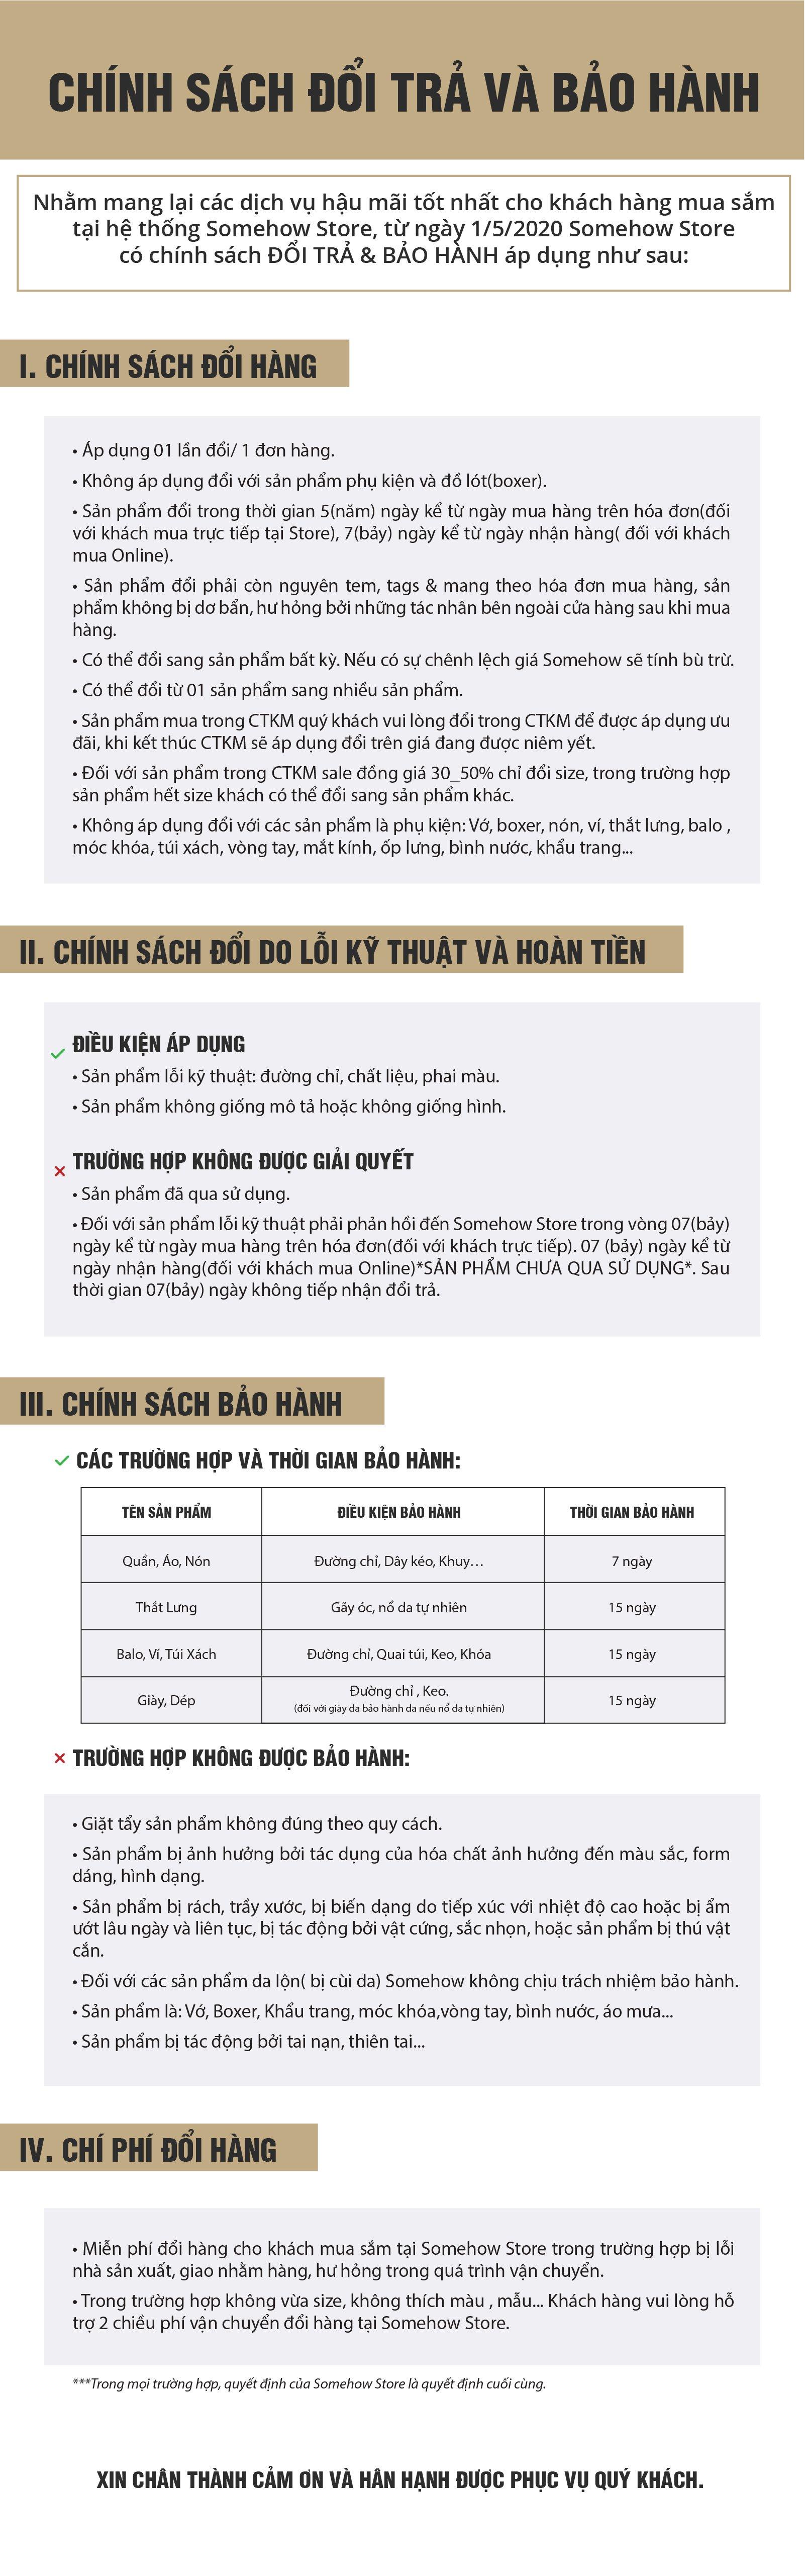 chinh-sach-doi-tra